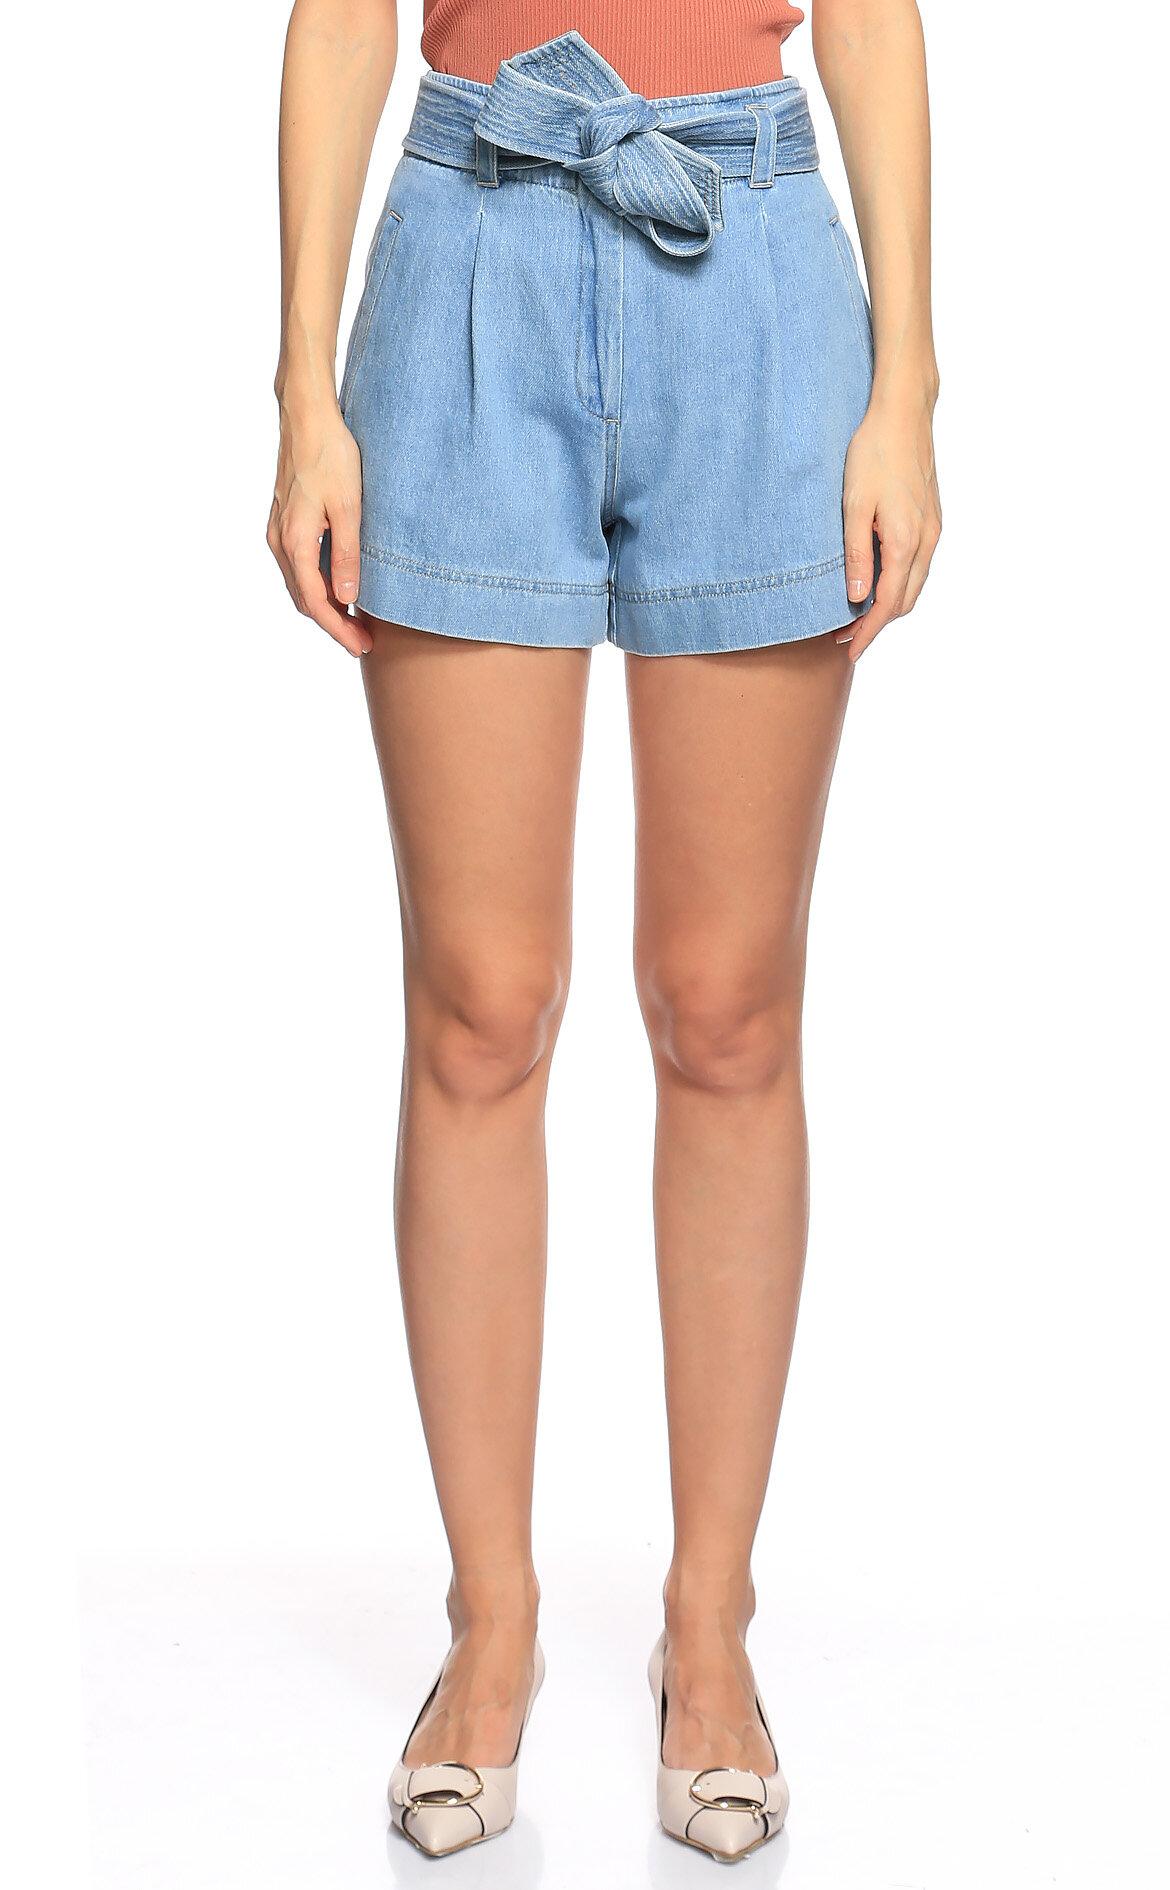 Nisse-Nisse Yüksek Belli Mavi Jean Pantolon